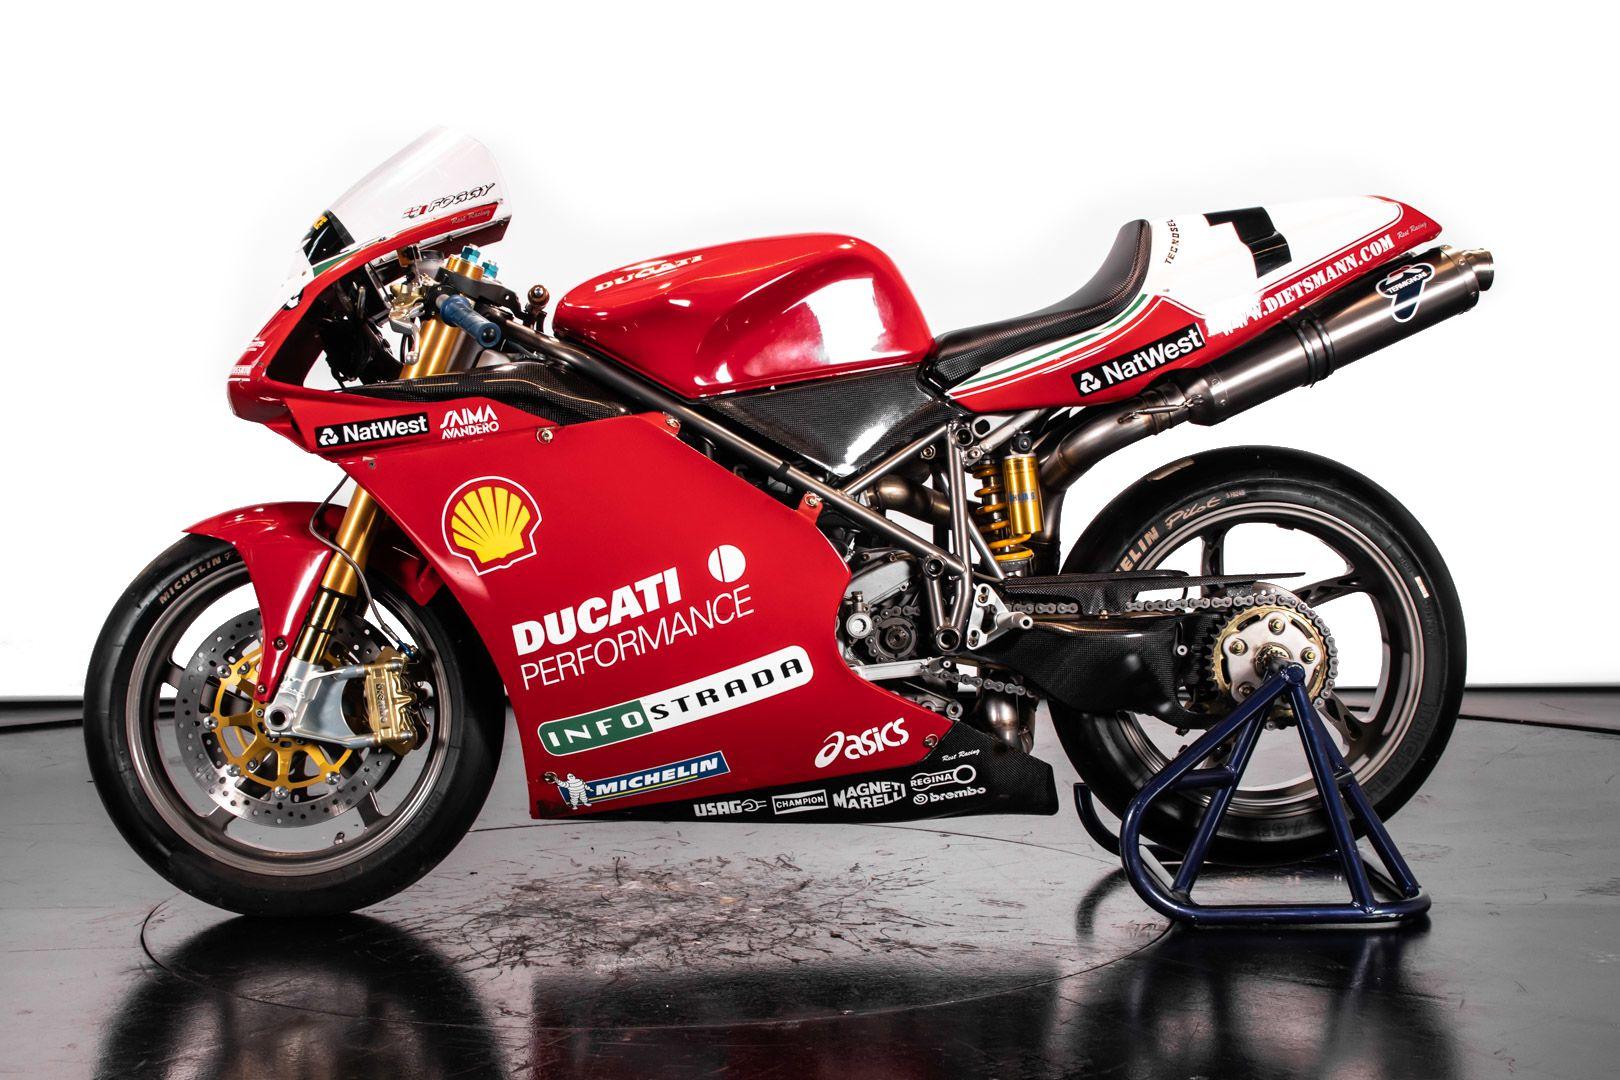 2008 Ducati 996 Fogarty Evocation 03/12 84242